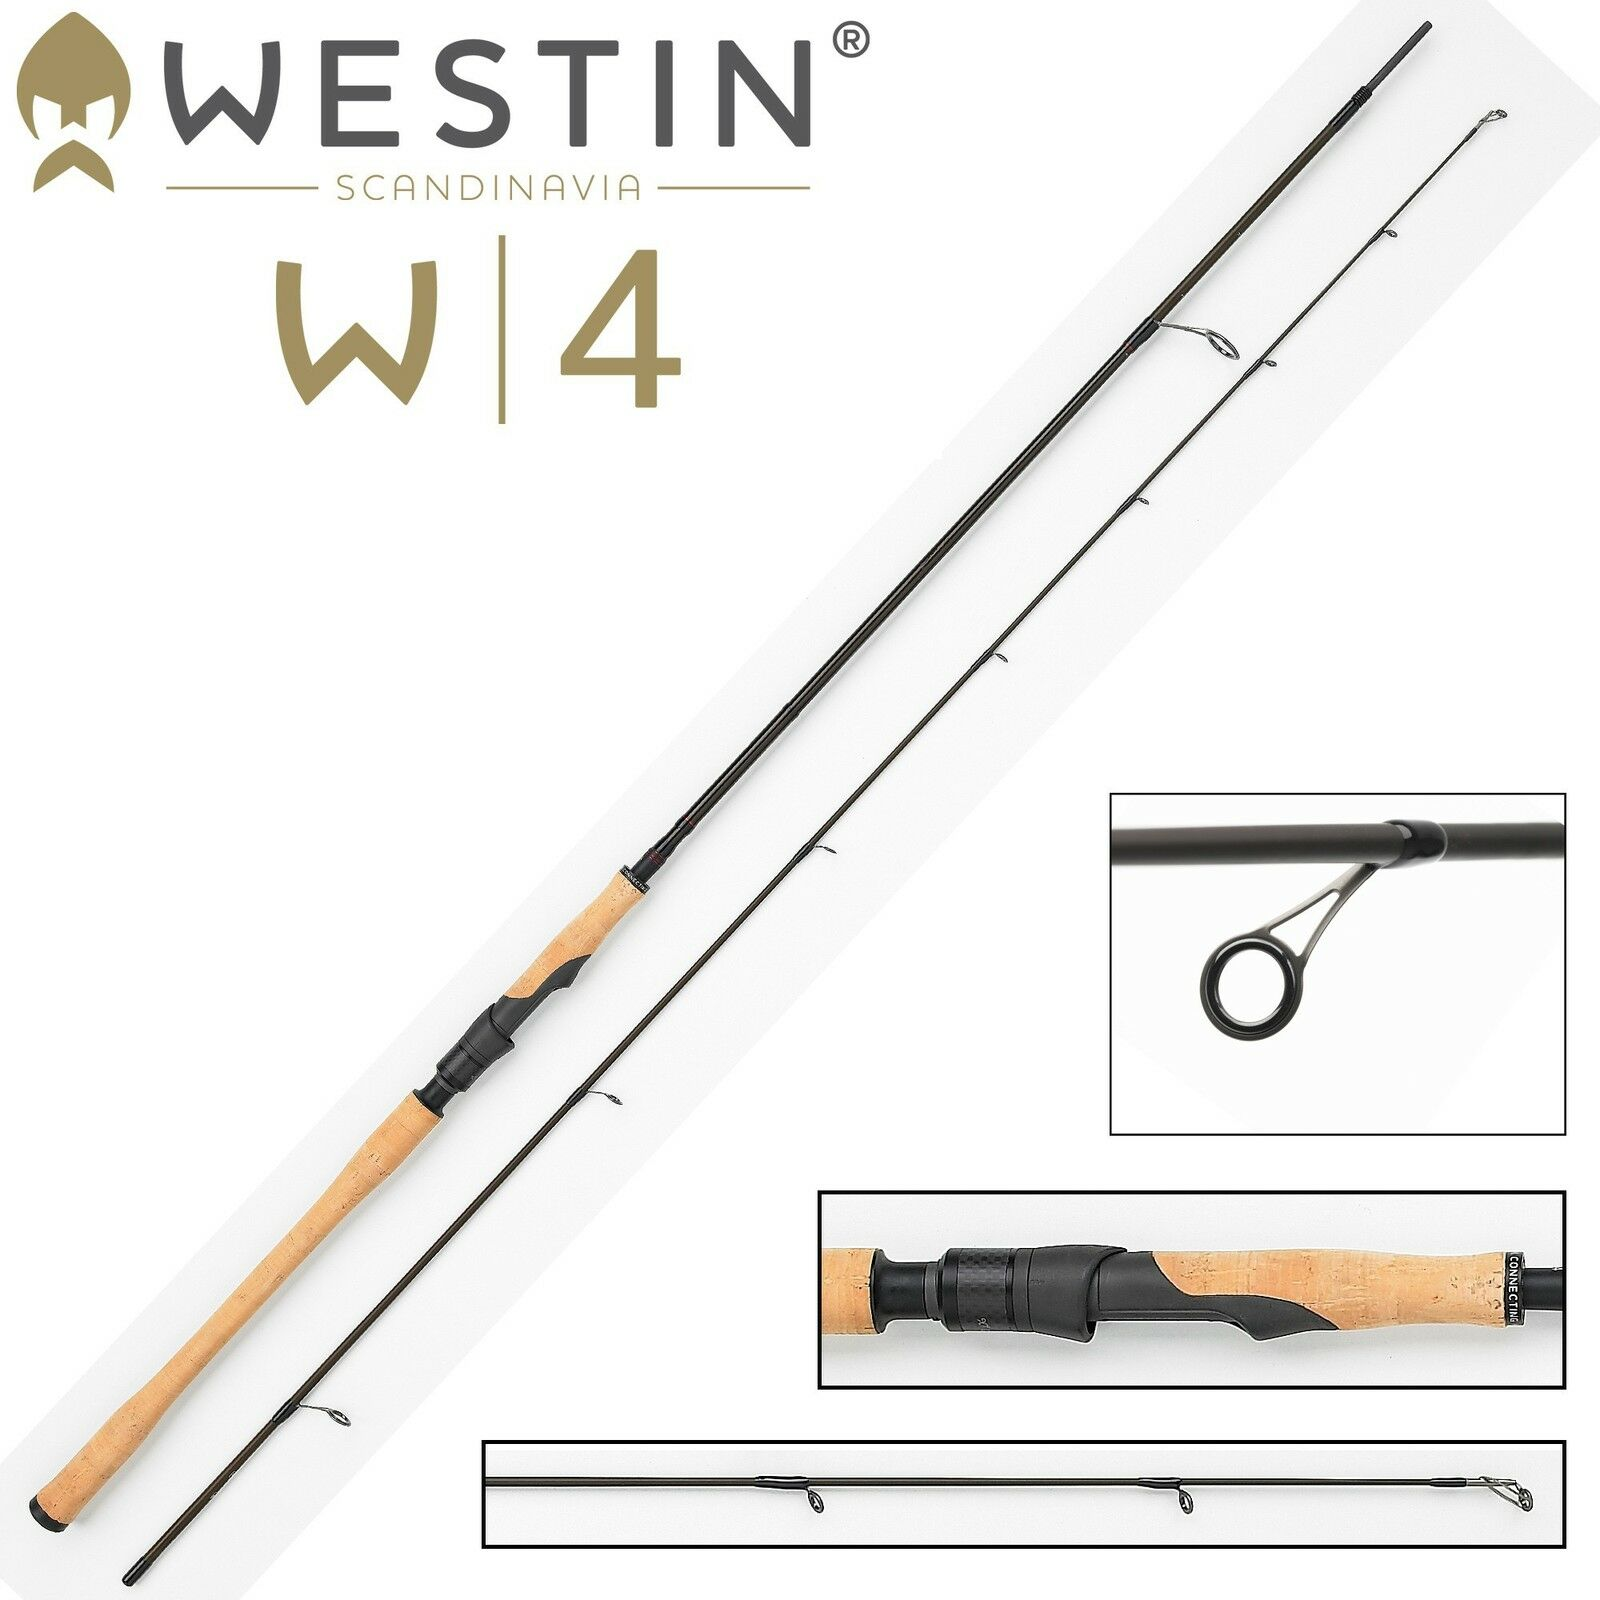 Westin W4 Spin 300cm M 7-30g Spinnrute für Meerforellen Blinkerrute